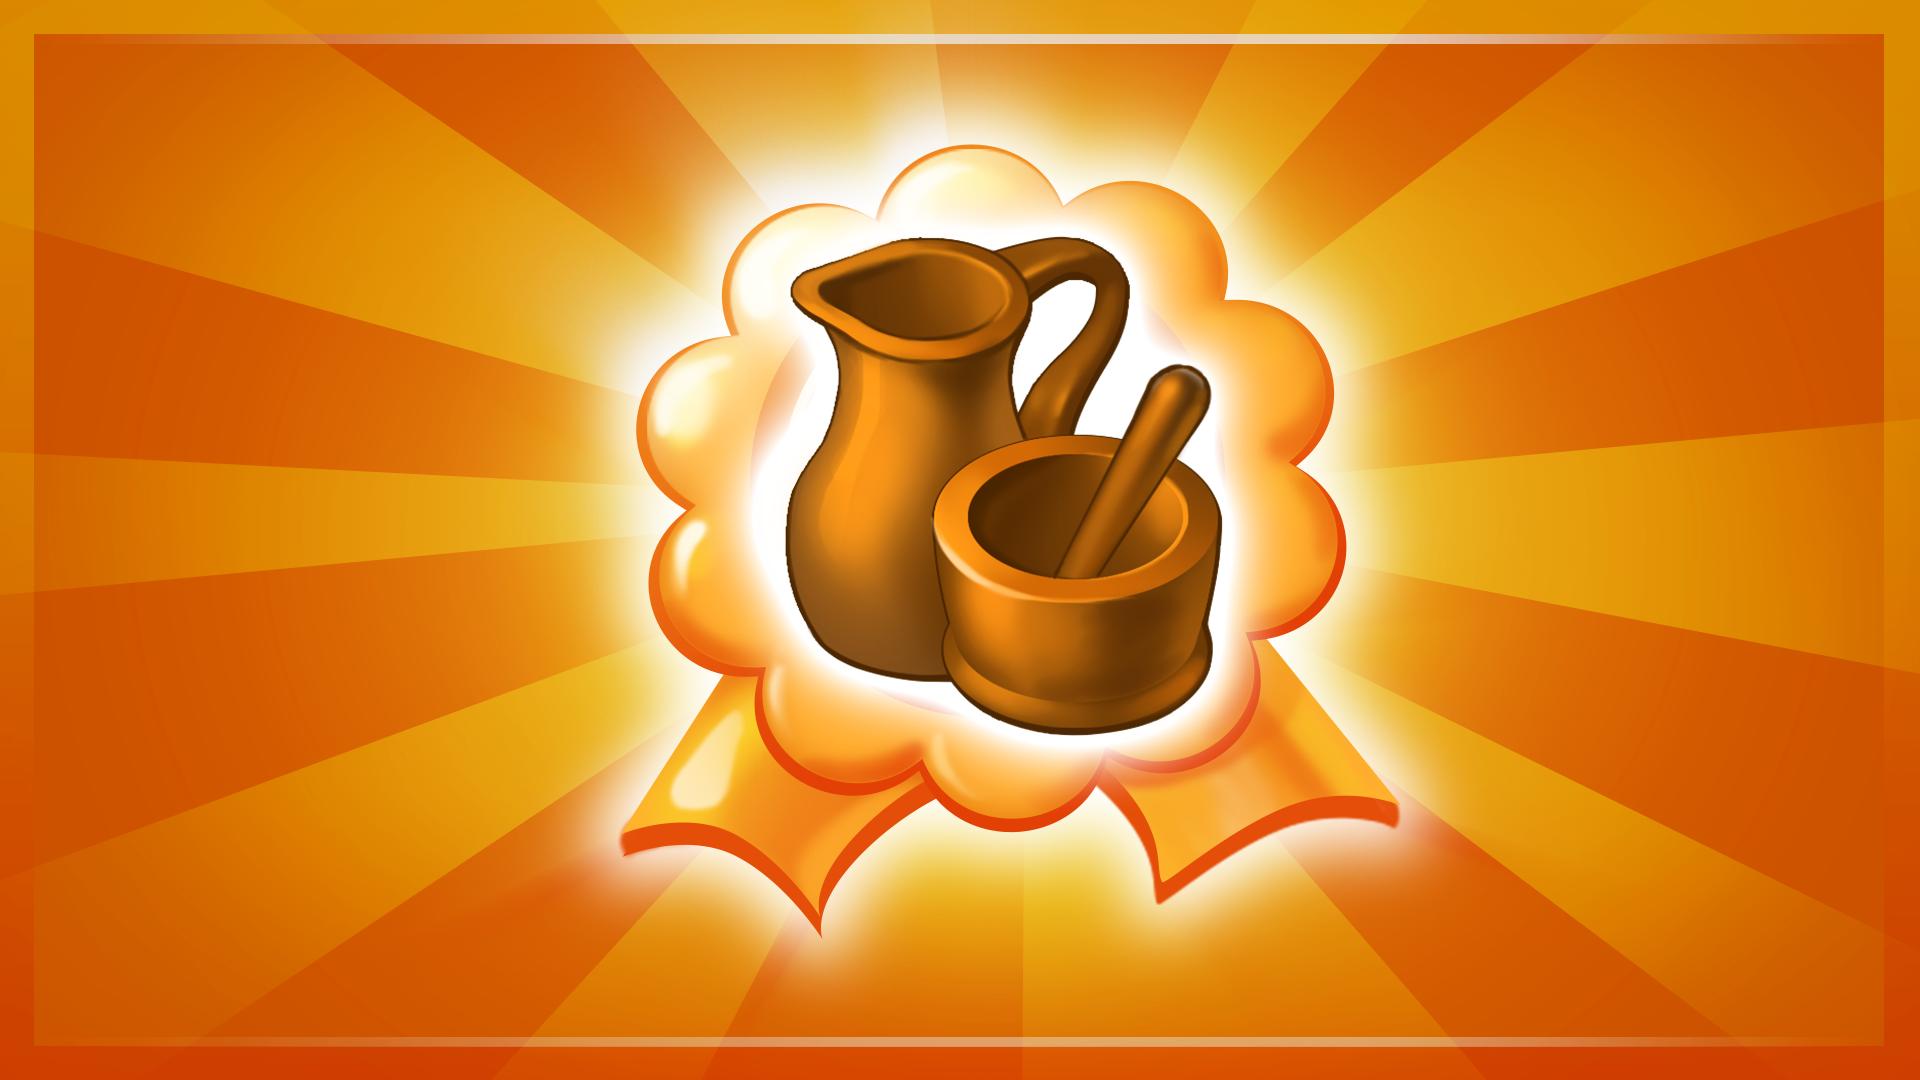 Icon for Porcelain Shop